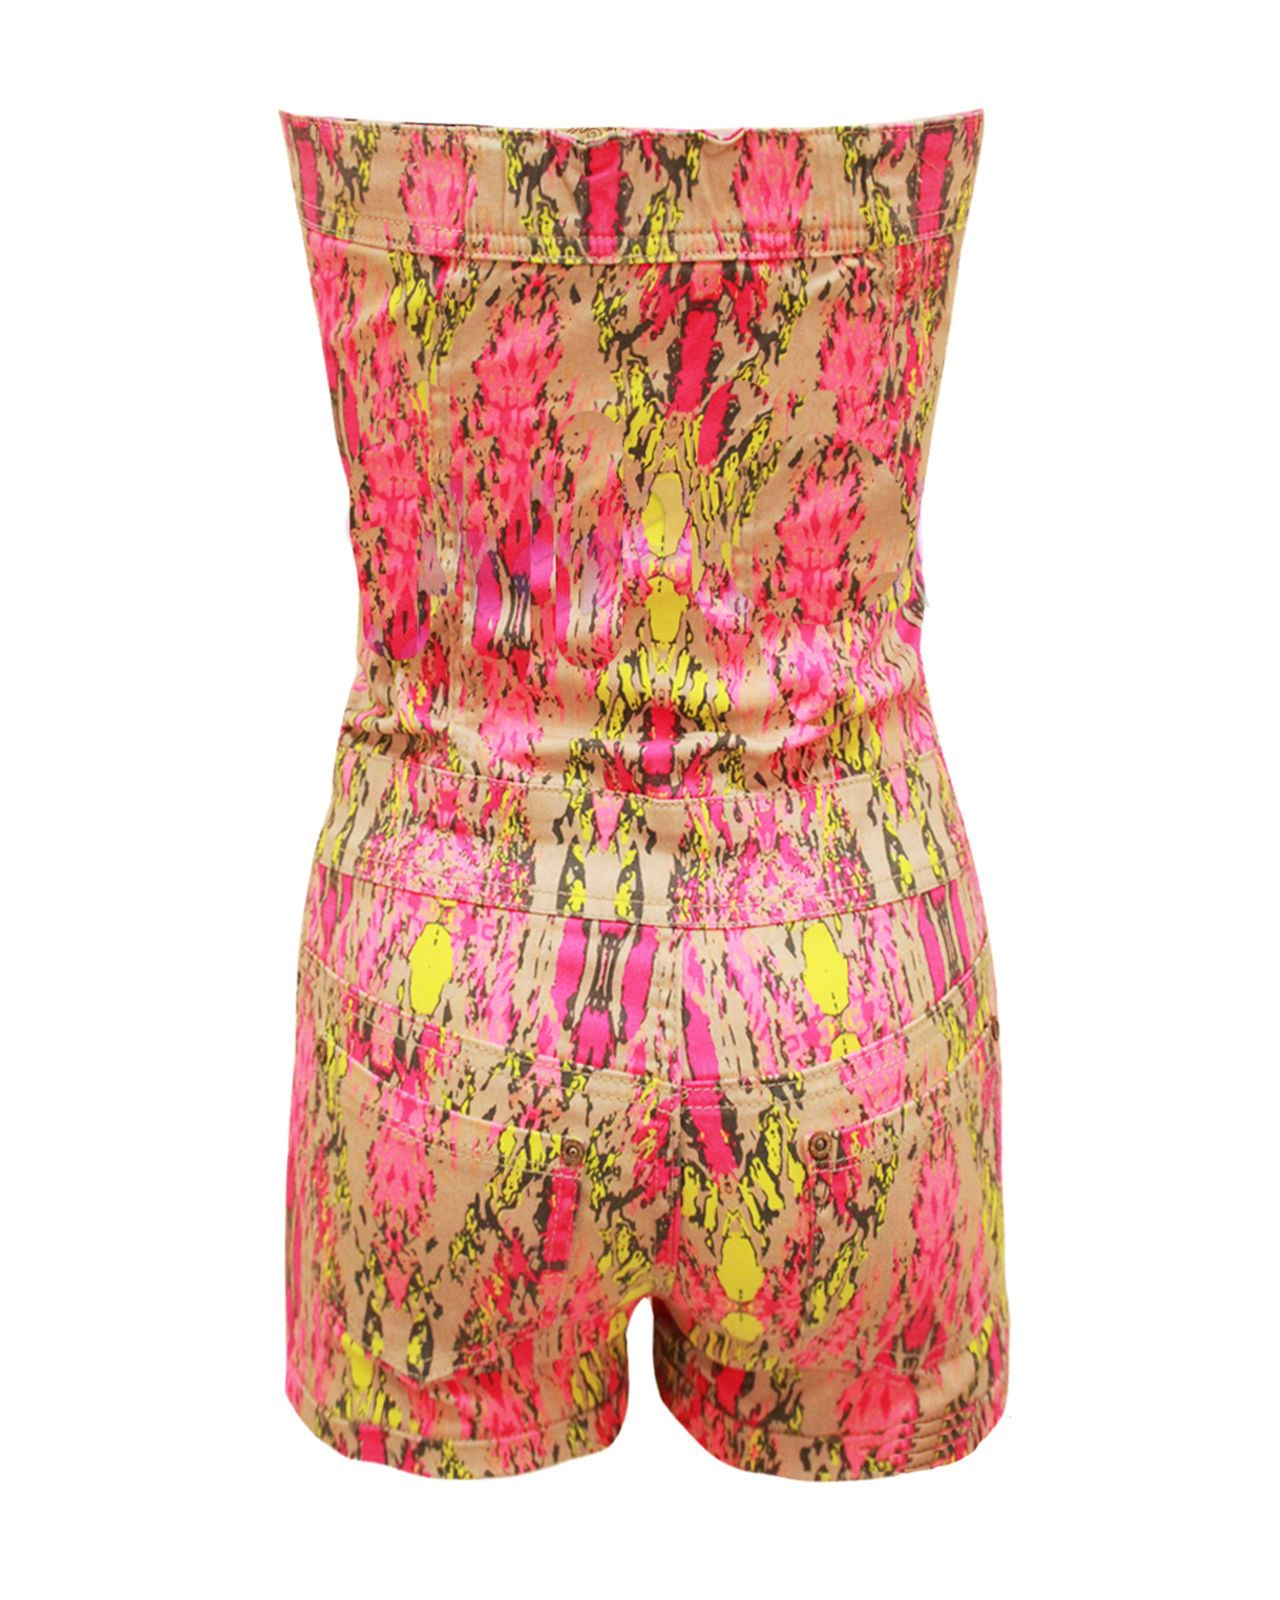 Senoras-para-mujer-Tie-Dye-Impreso-Sin-Tirantes-Boobtube-Hotpant-Mono-Mono-corto-6-14 miniatura 3